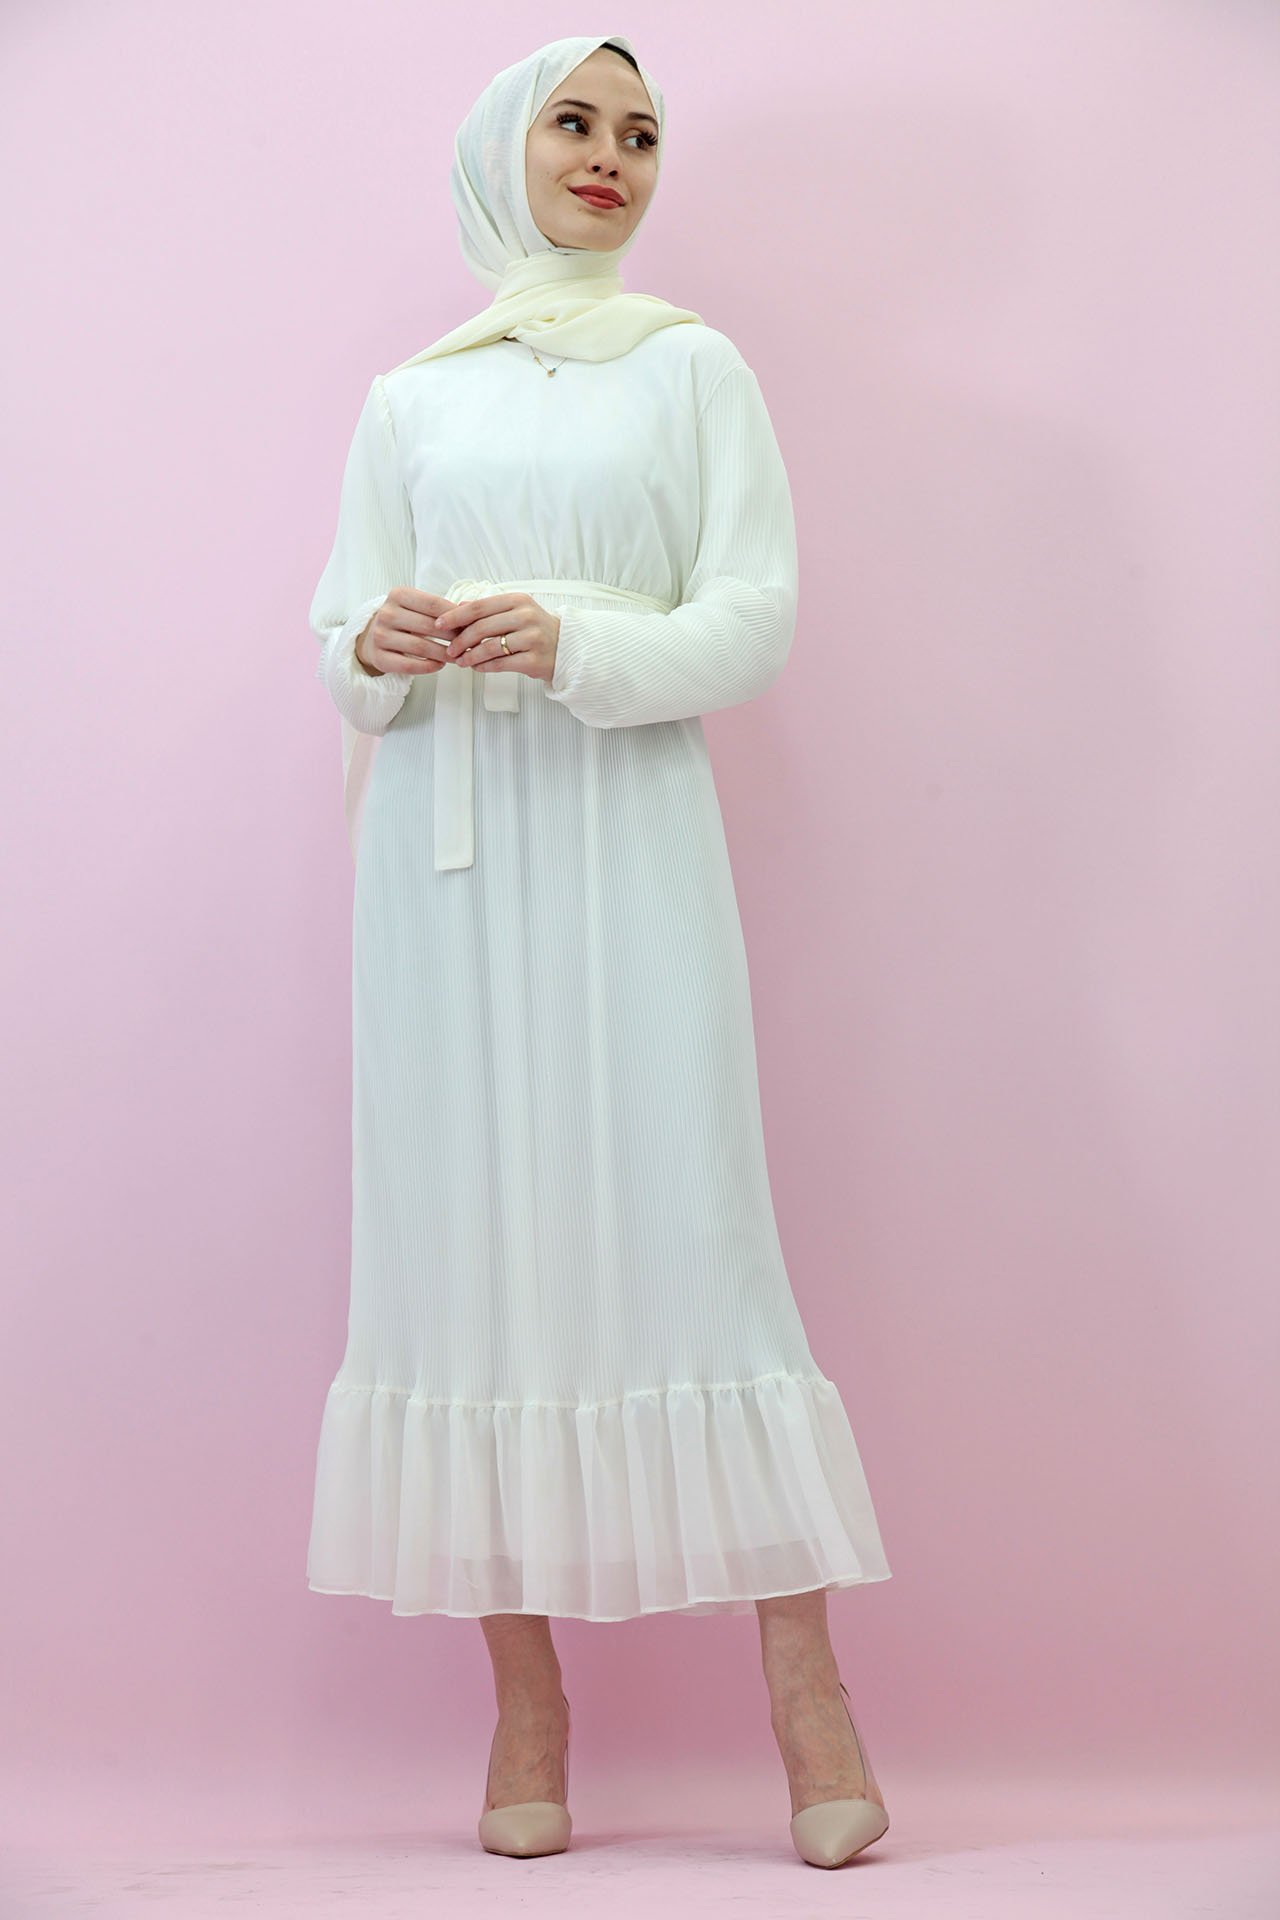 GİZAGİYİM - Kolu Lastikli Pilisoley Elbise Beyaz